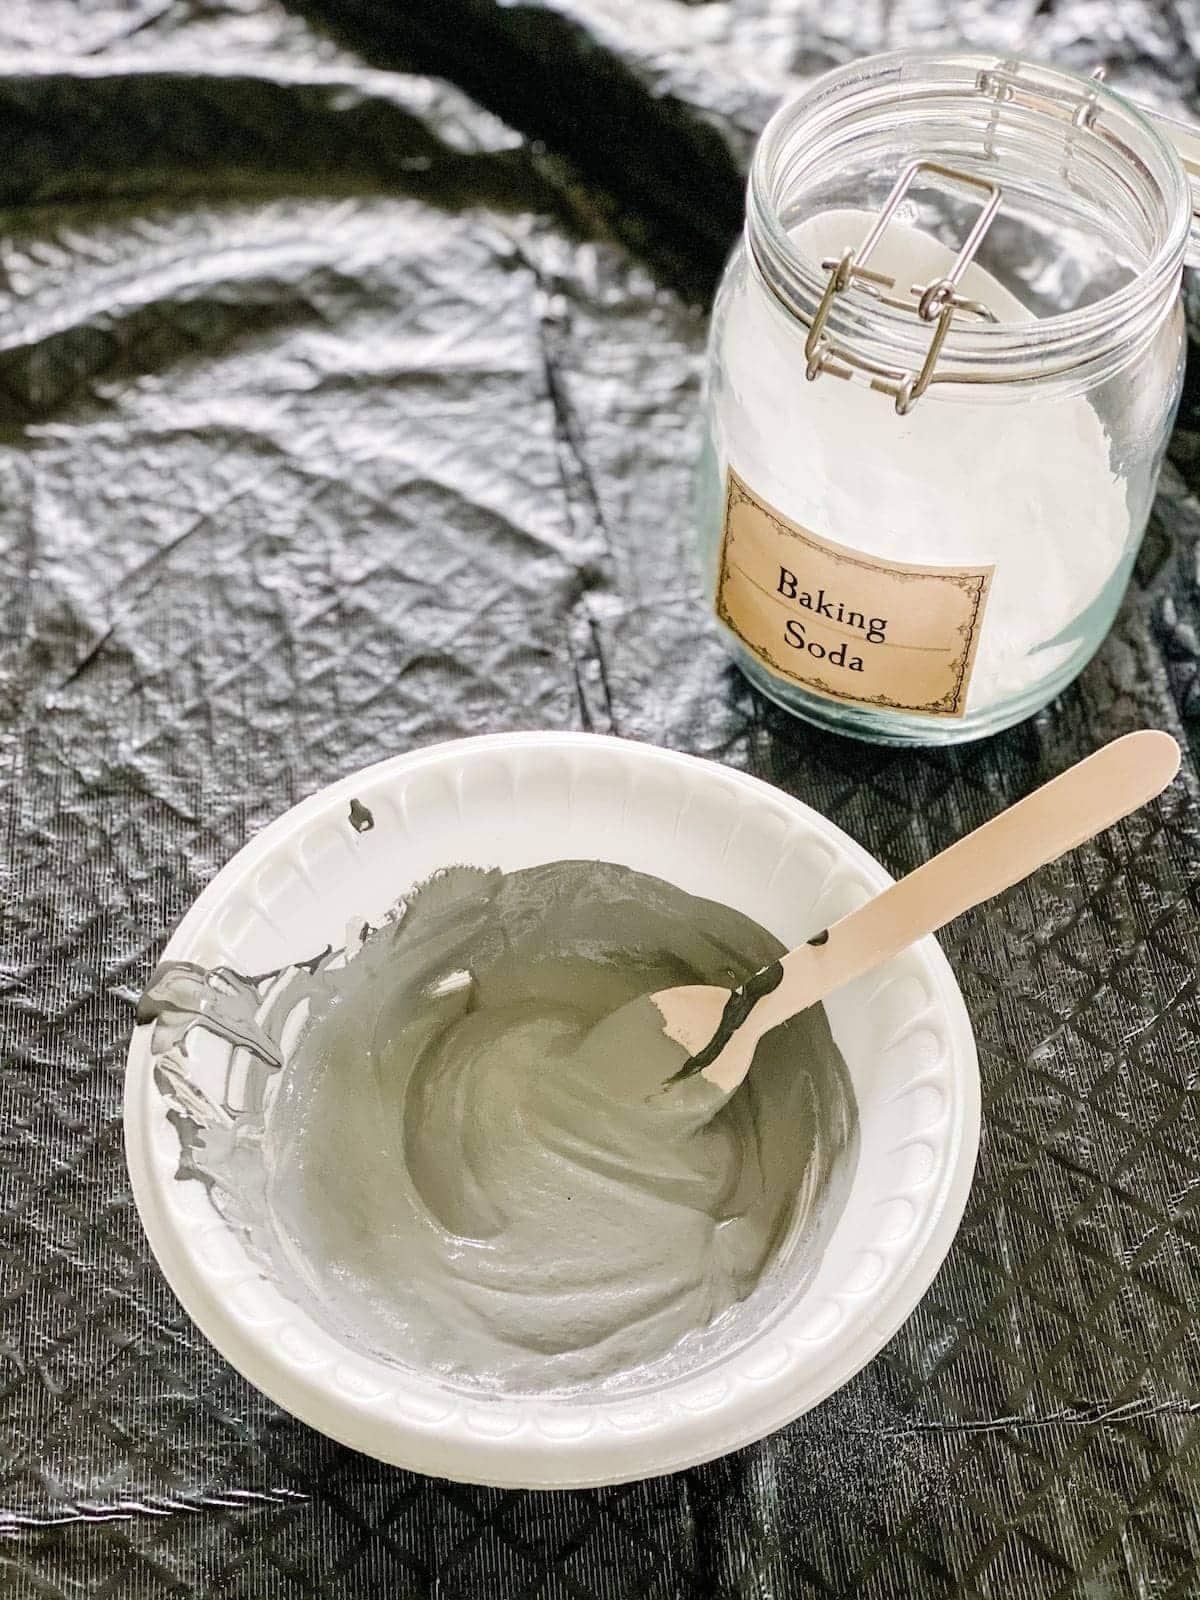 diy texture paint using baking soda